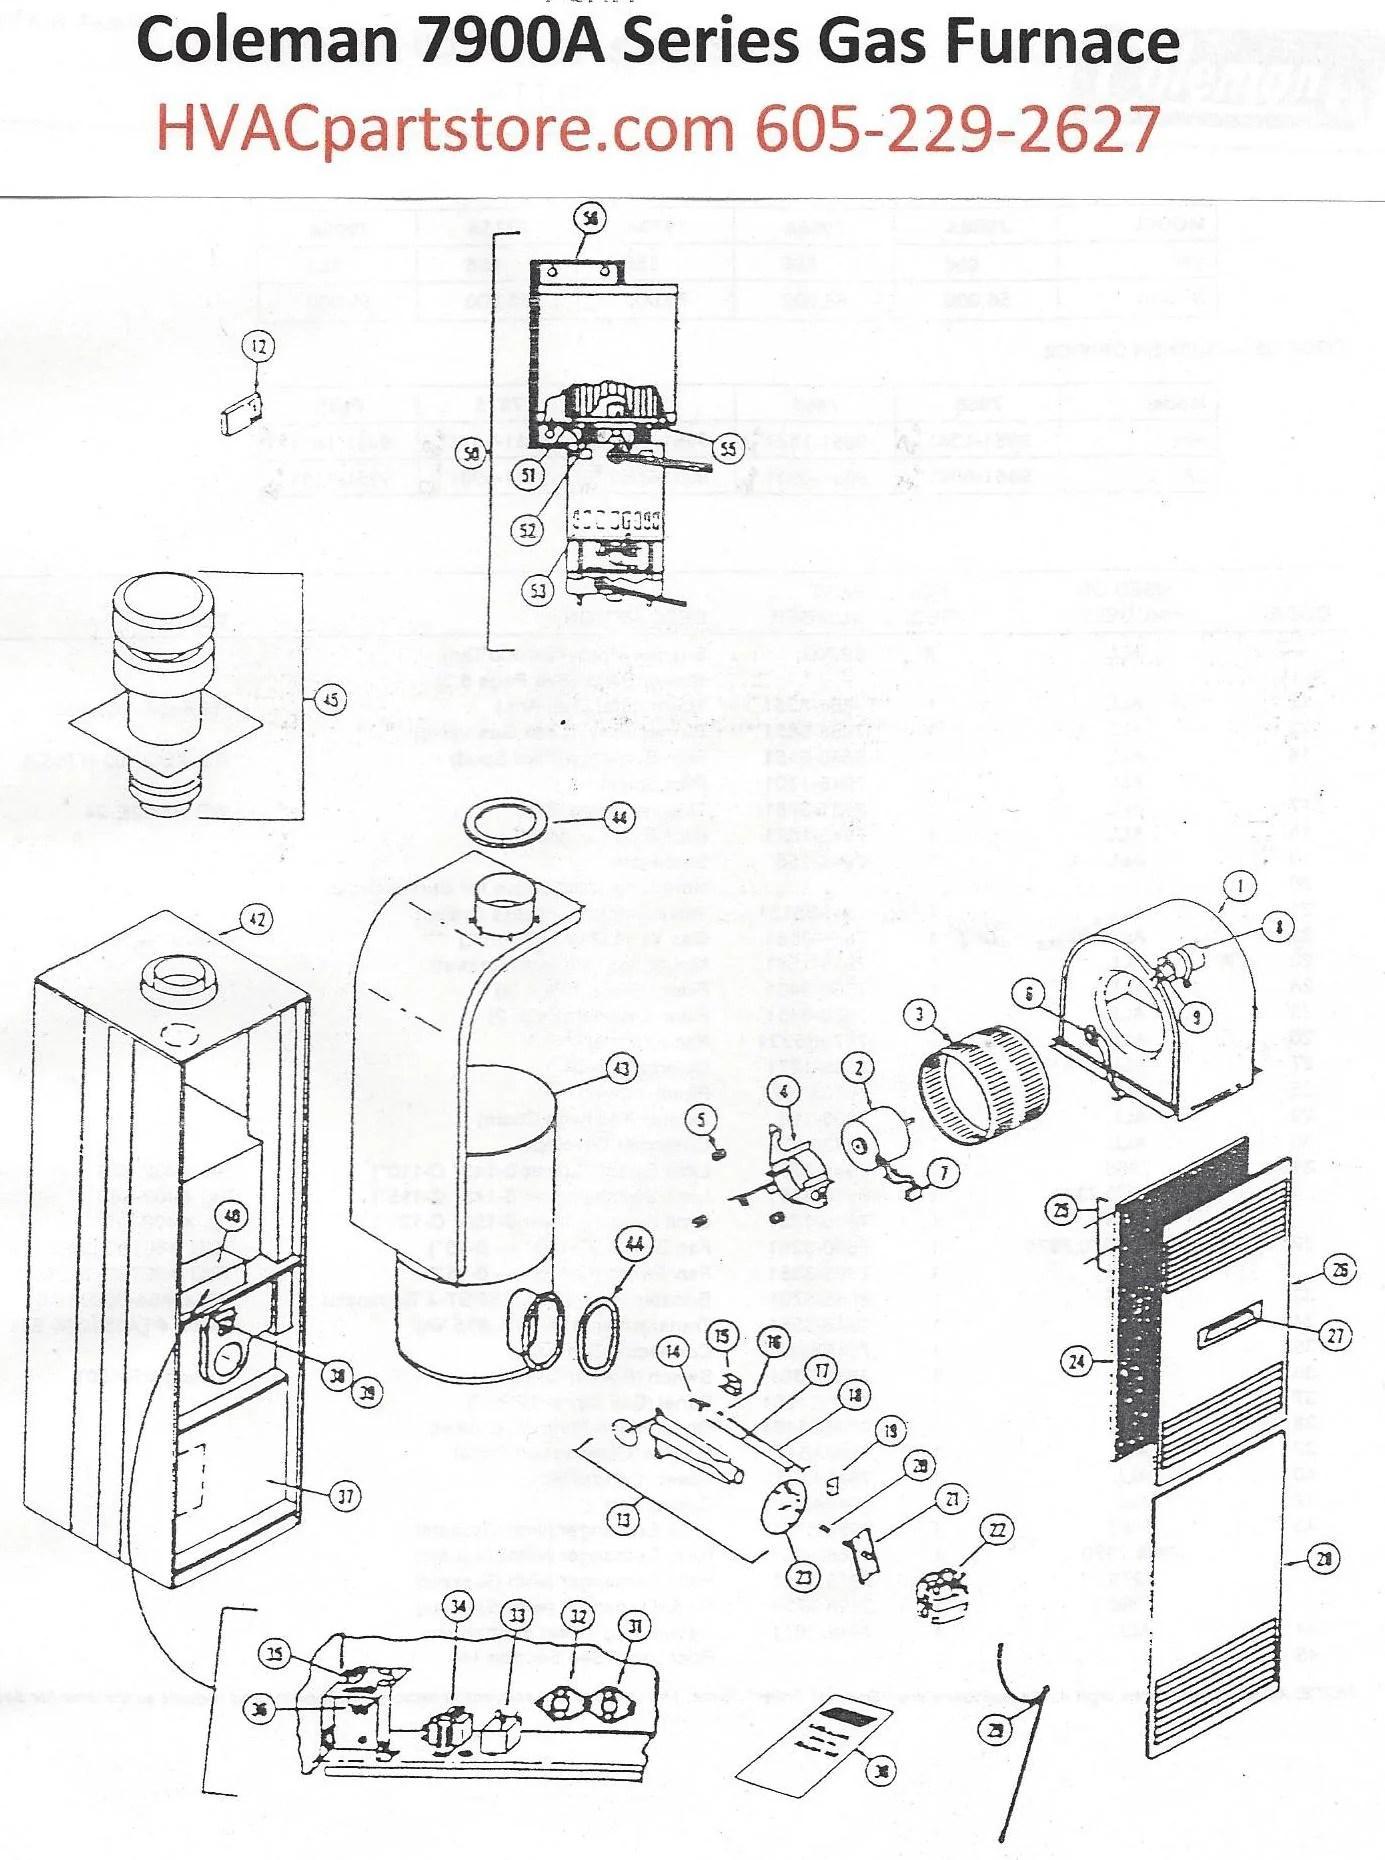 Coleman 7975 Furnace Wiring Diagram, Coleman, Free Engine